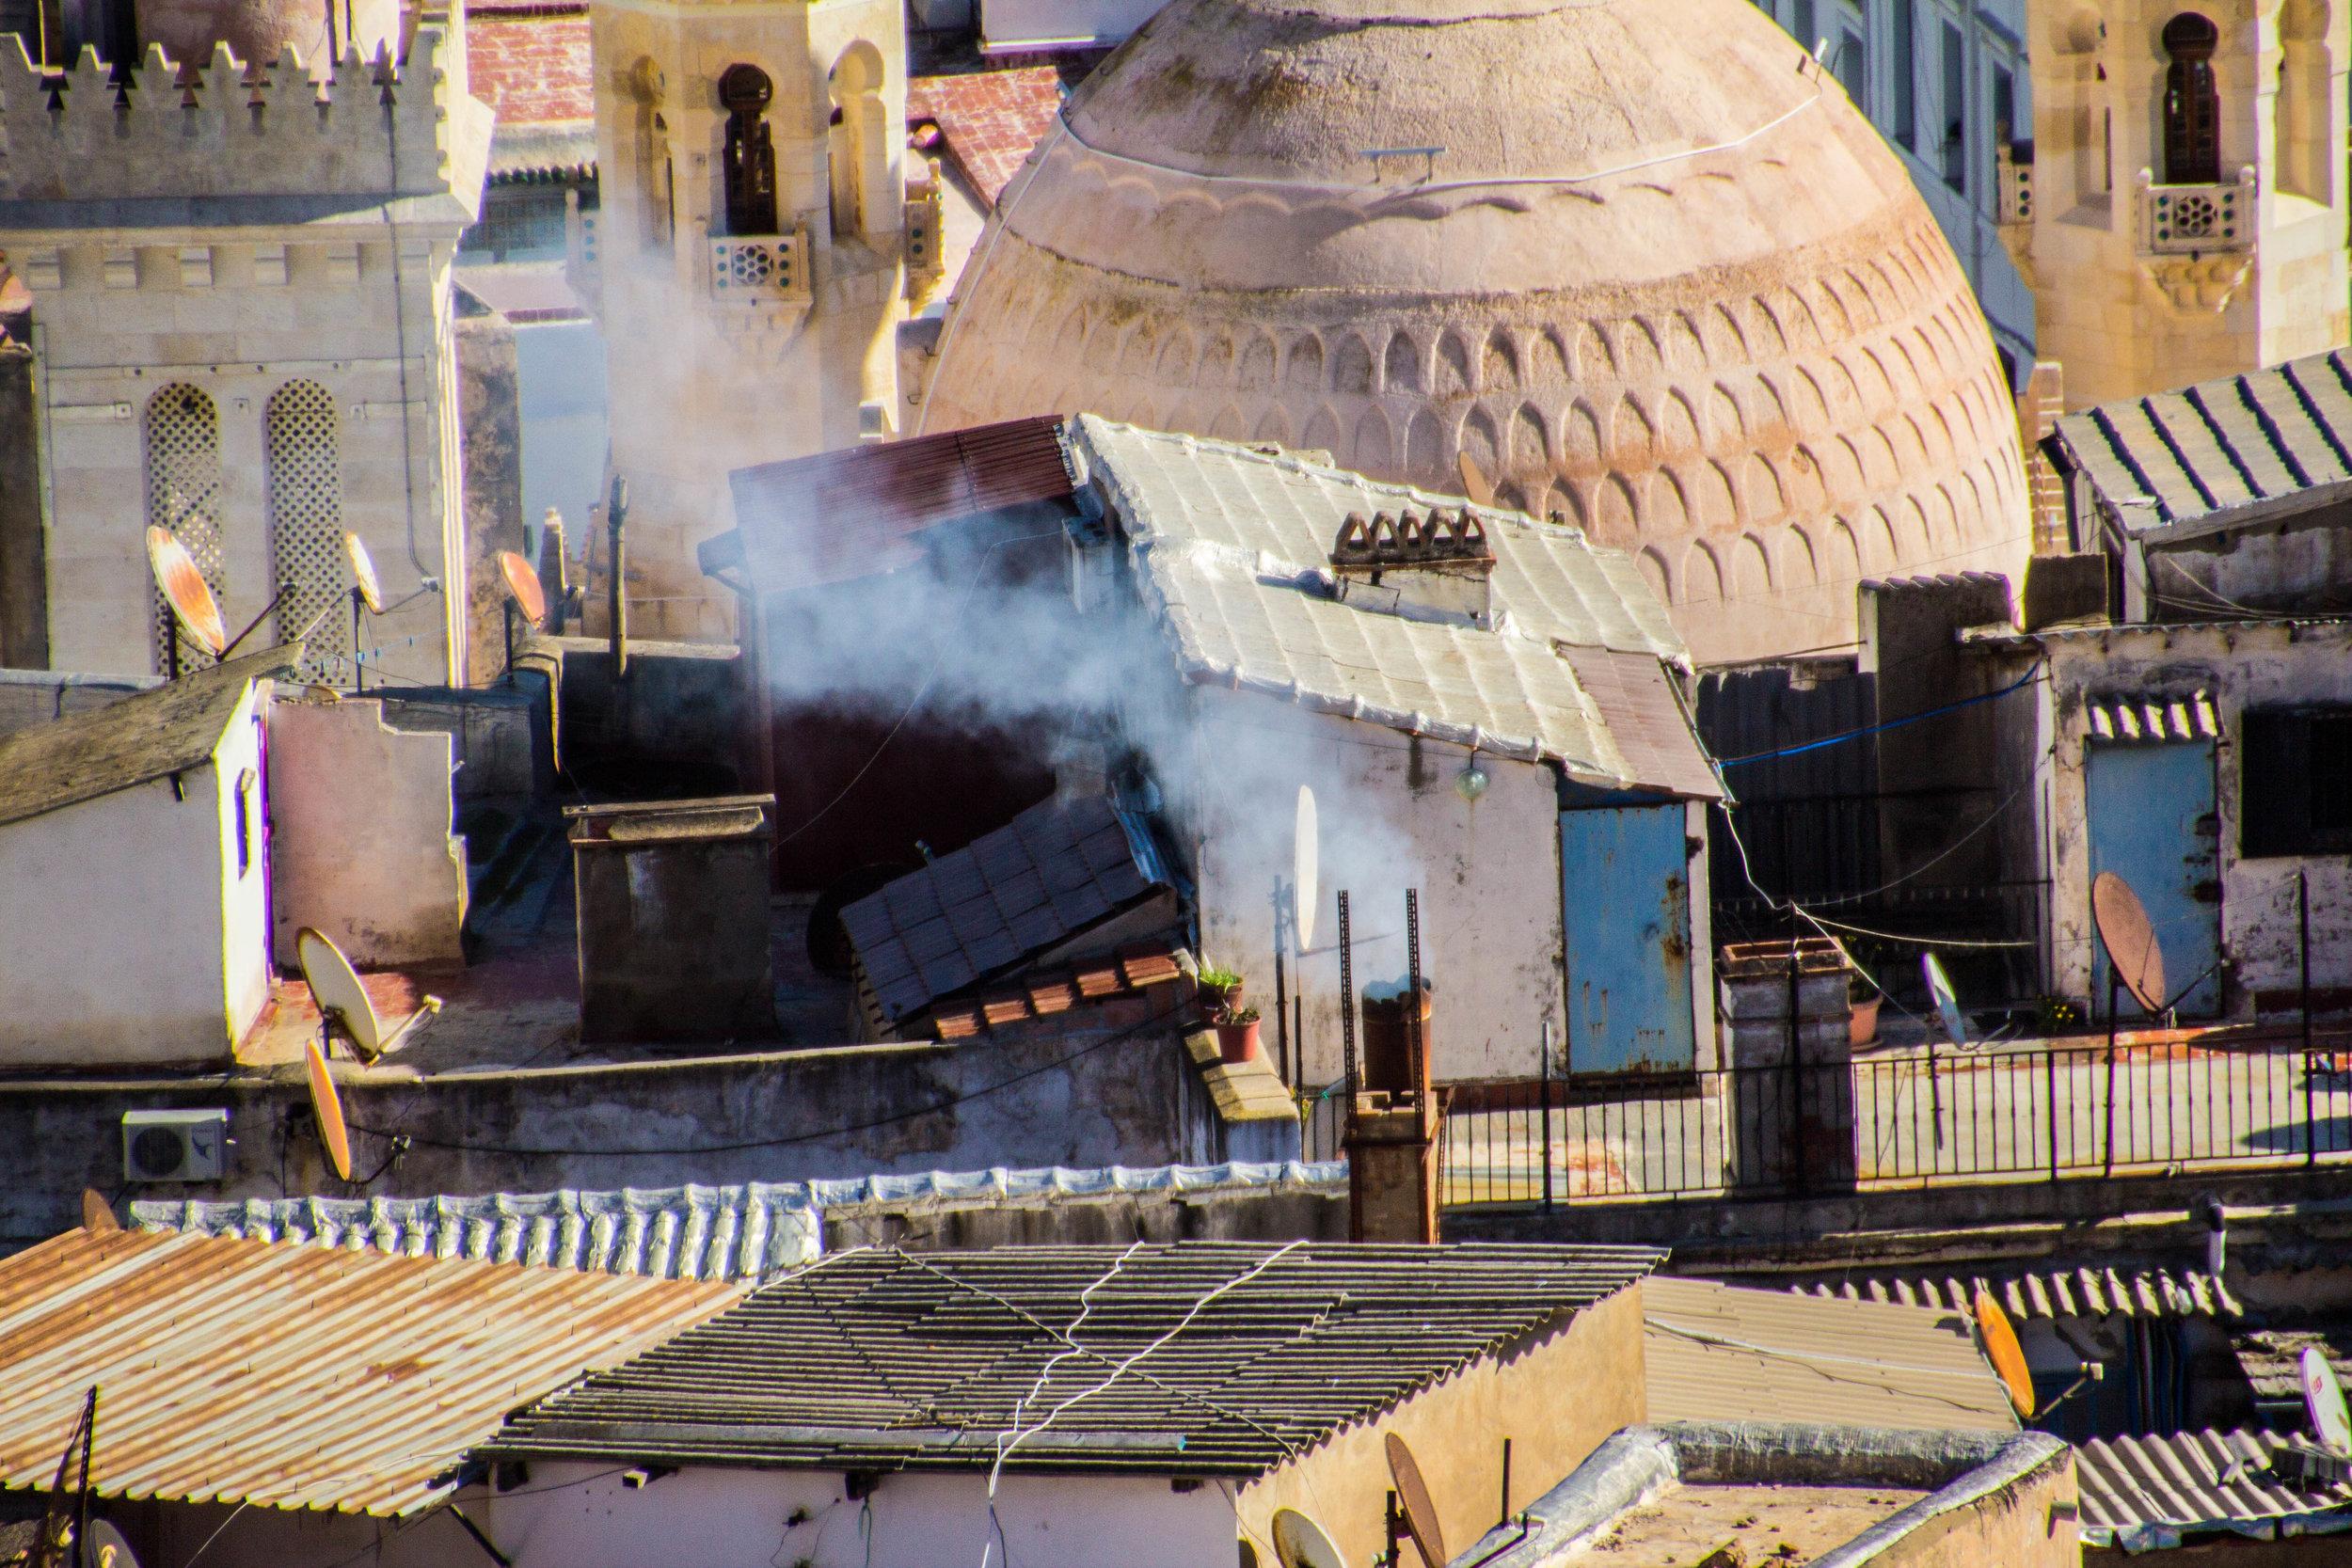 casbah-from-above-algiers-algeria-41.jpg